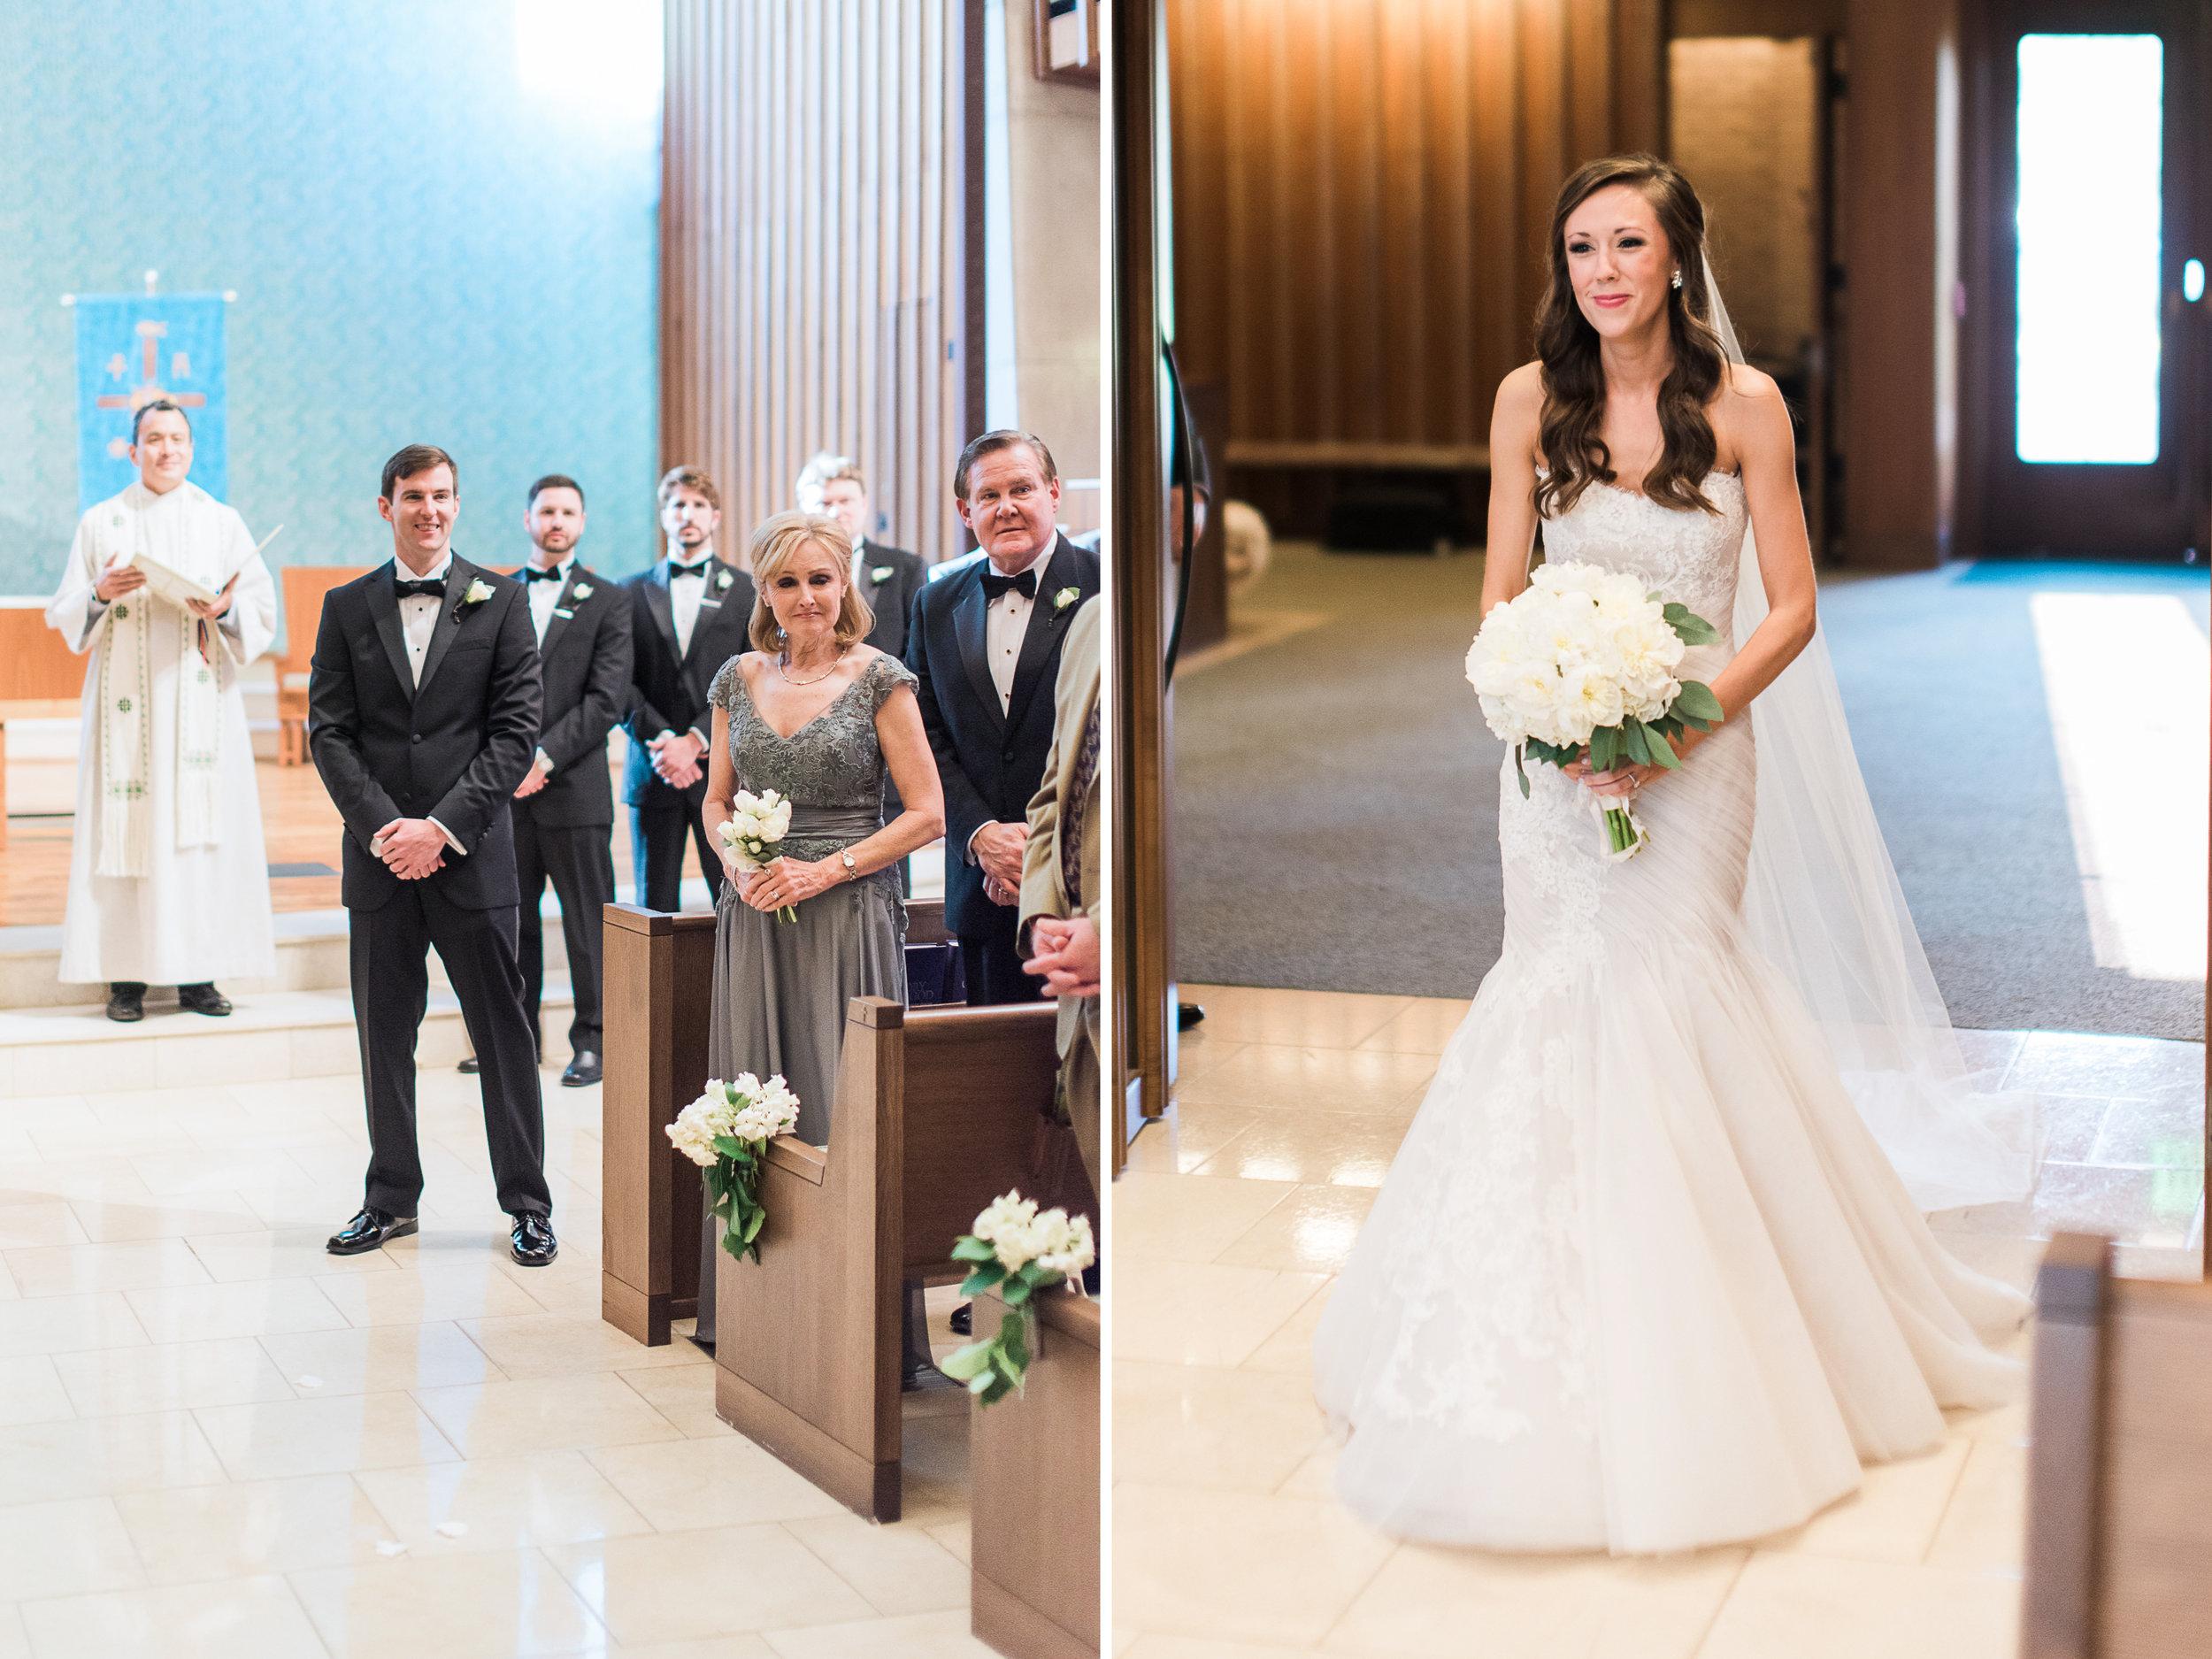 St.-Philip-Presbyterian-Church-Houston-Wedding-Ceremony-The-Junior-League-Of-Houston-Reception-Dana-Fernandez-Photography-Fine-Art-Film-116.jpg